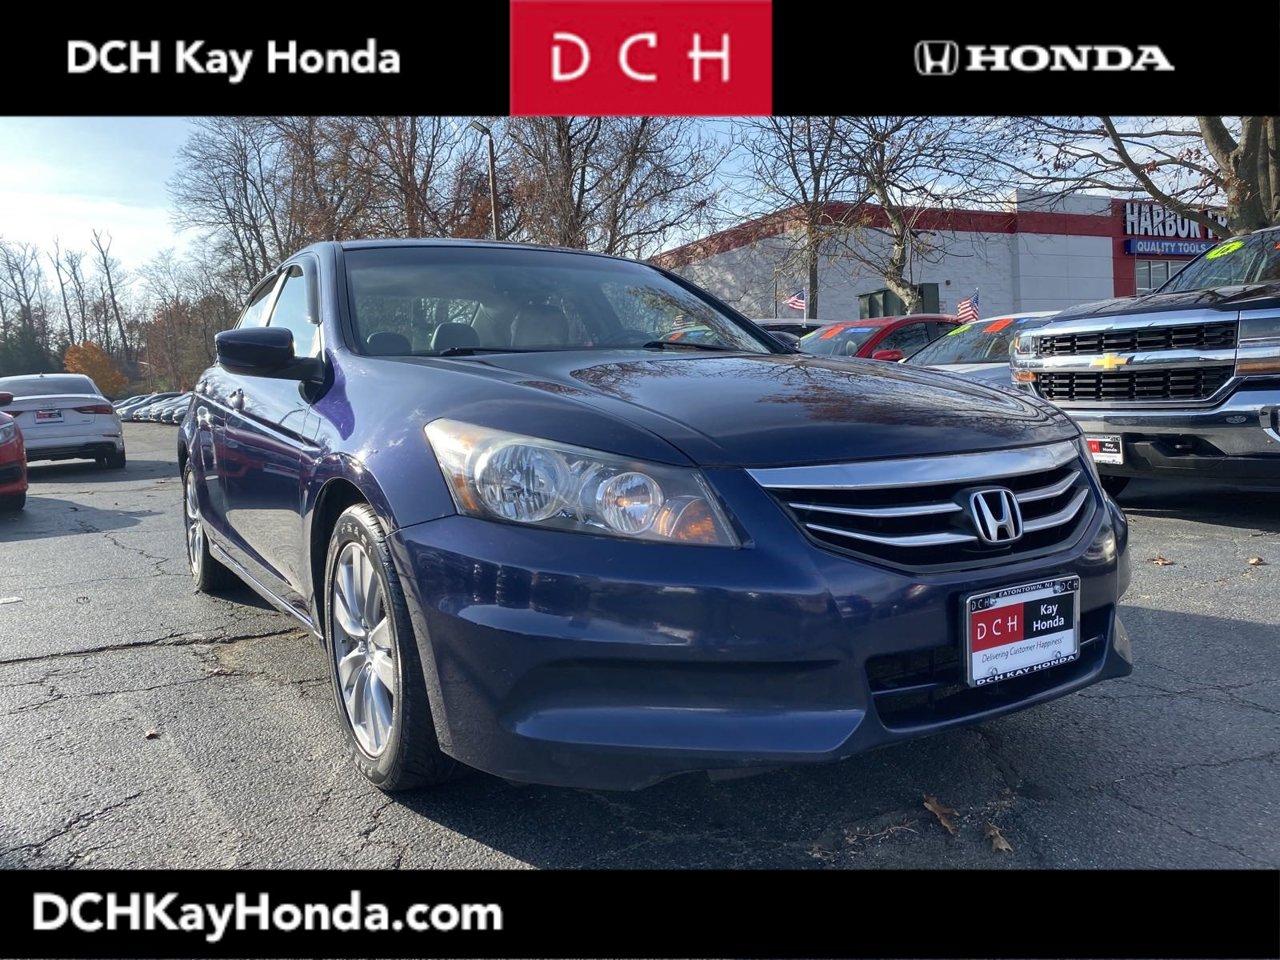 Used 2012 Honda Accord Sedan in Eatontown, NJ